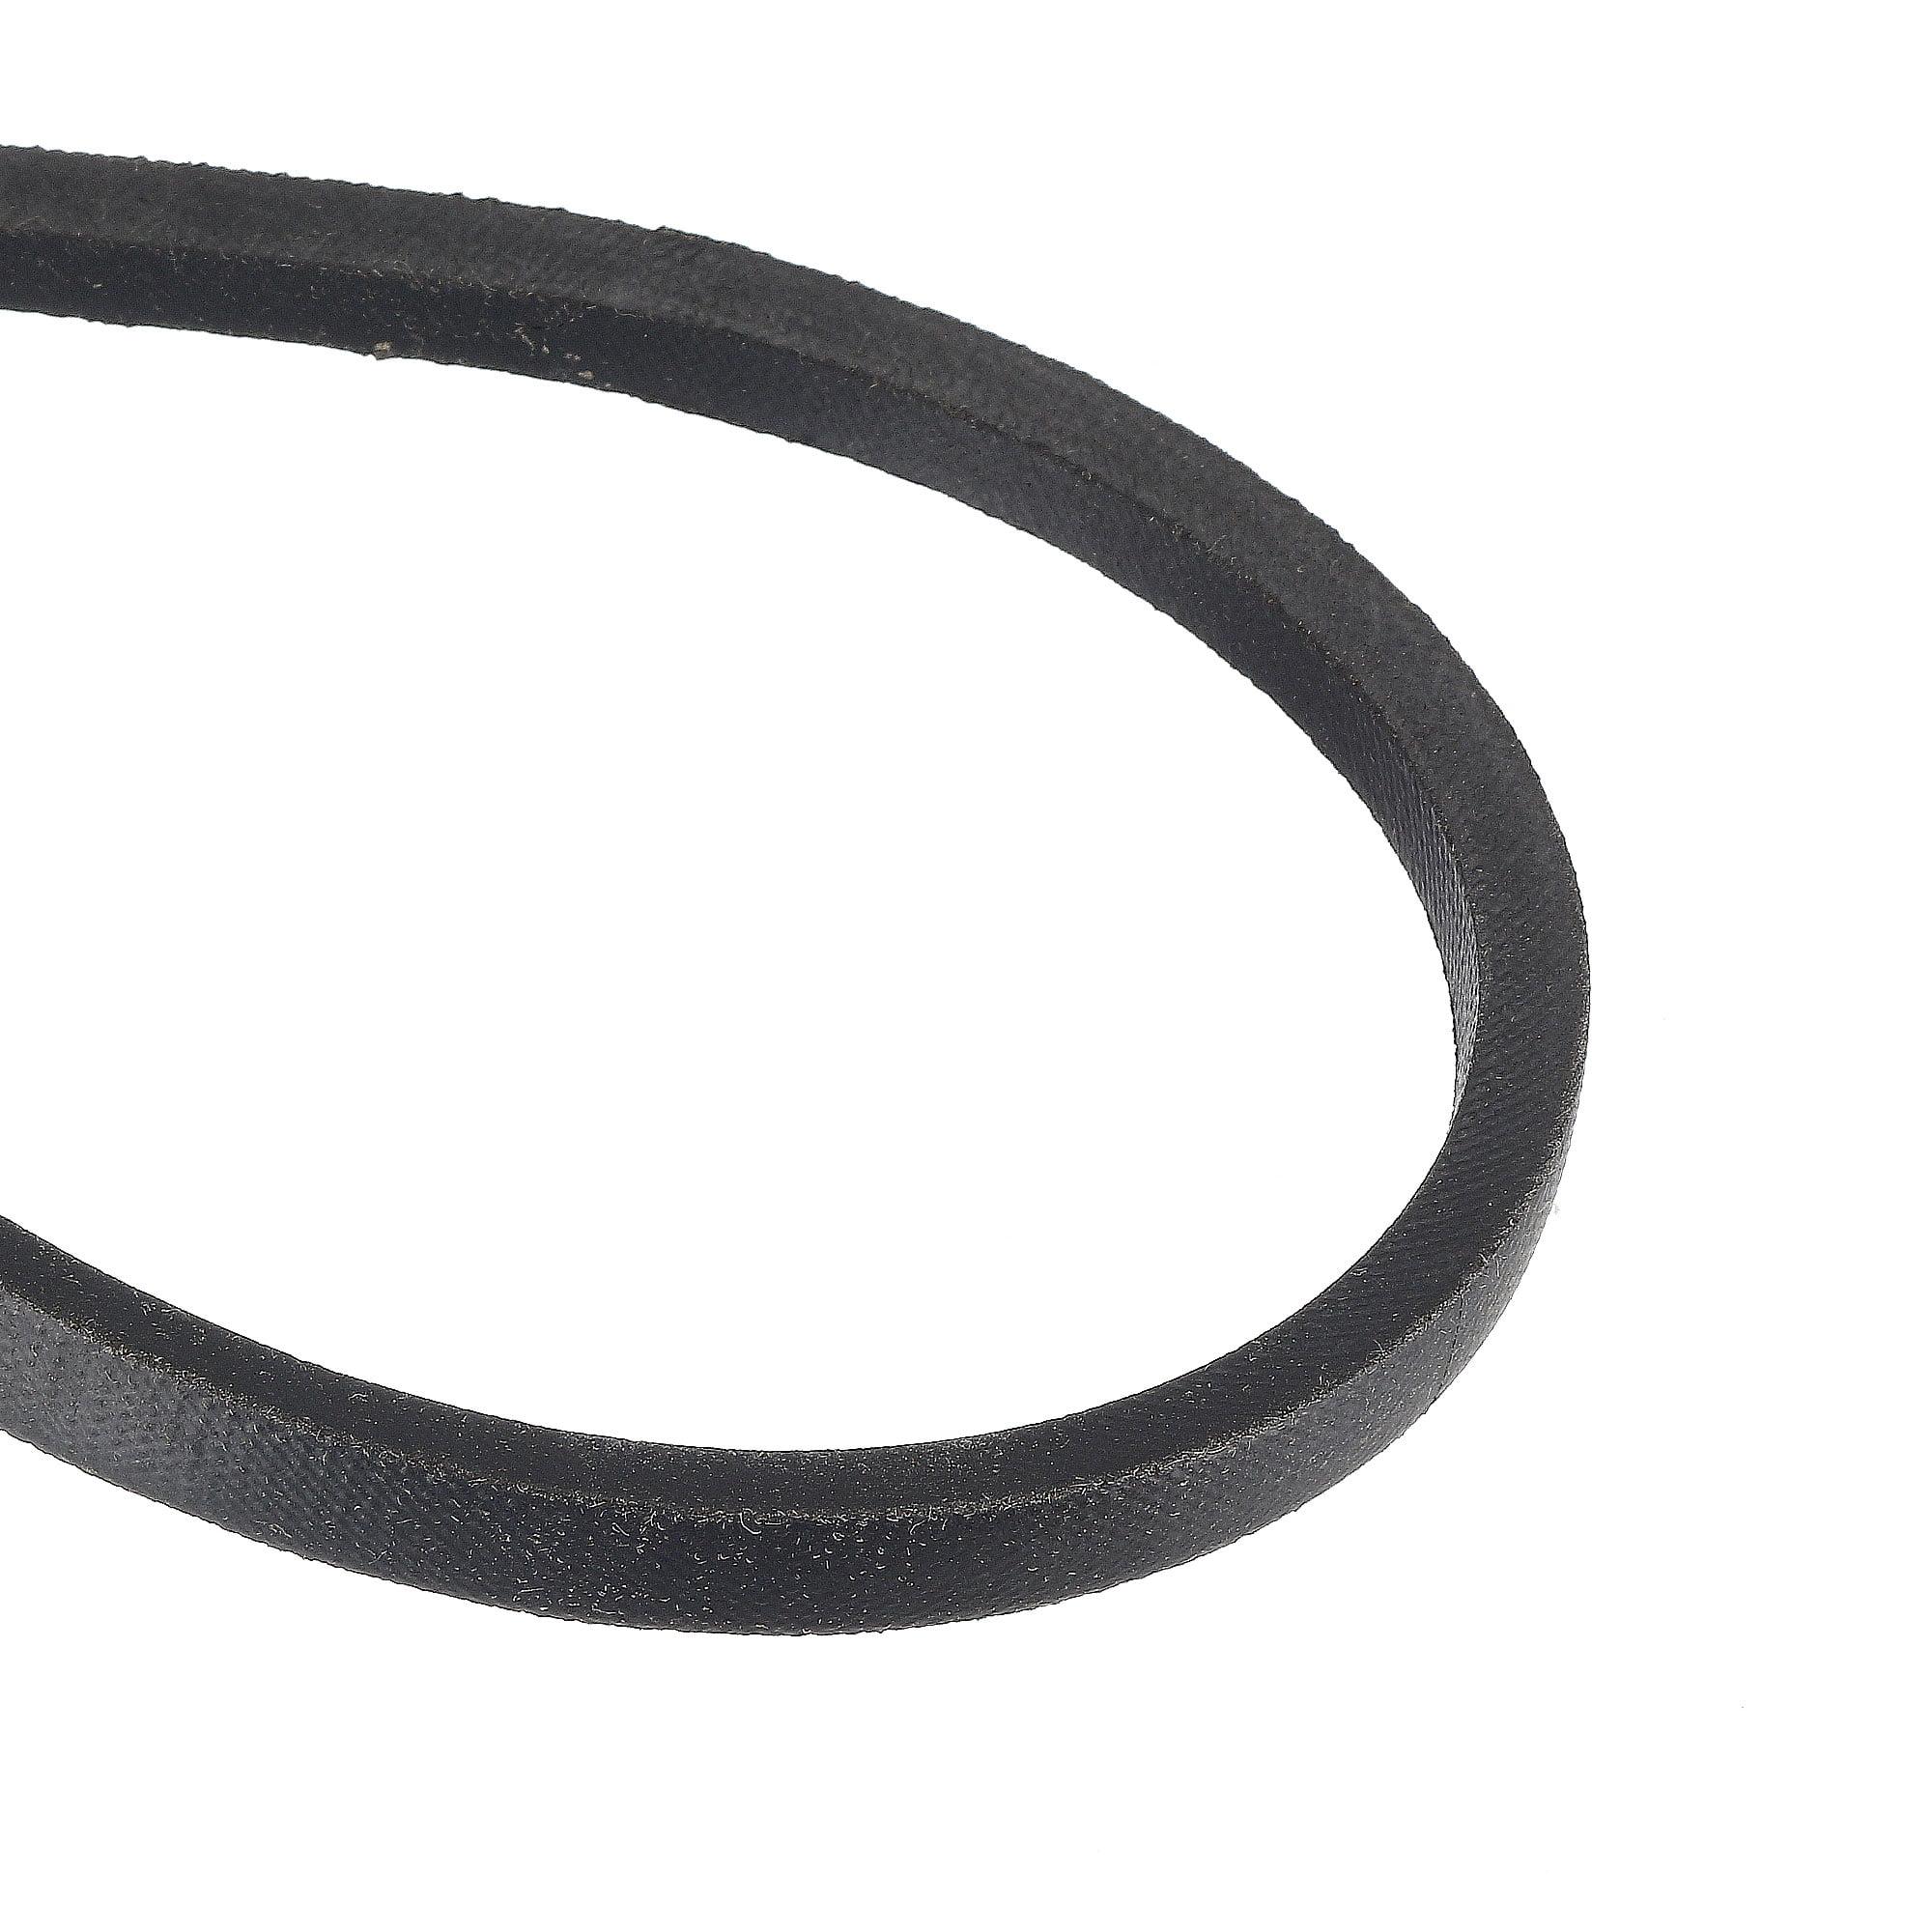 M31 V Belt Machine Transmission Rubber,Black Replacement Drive Belt